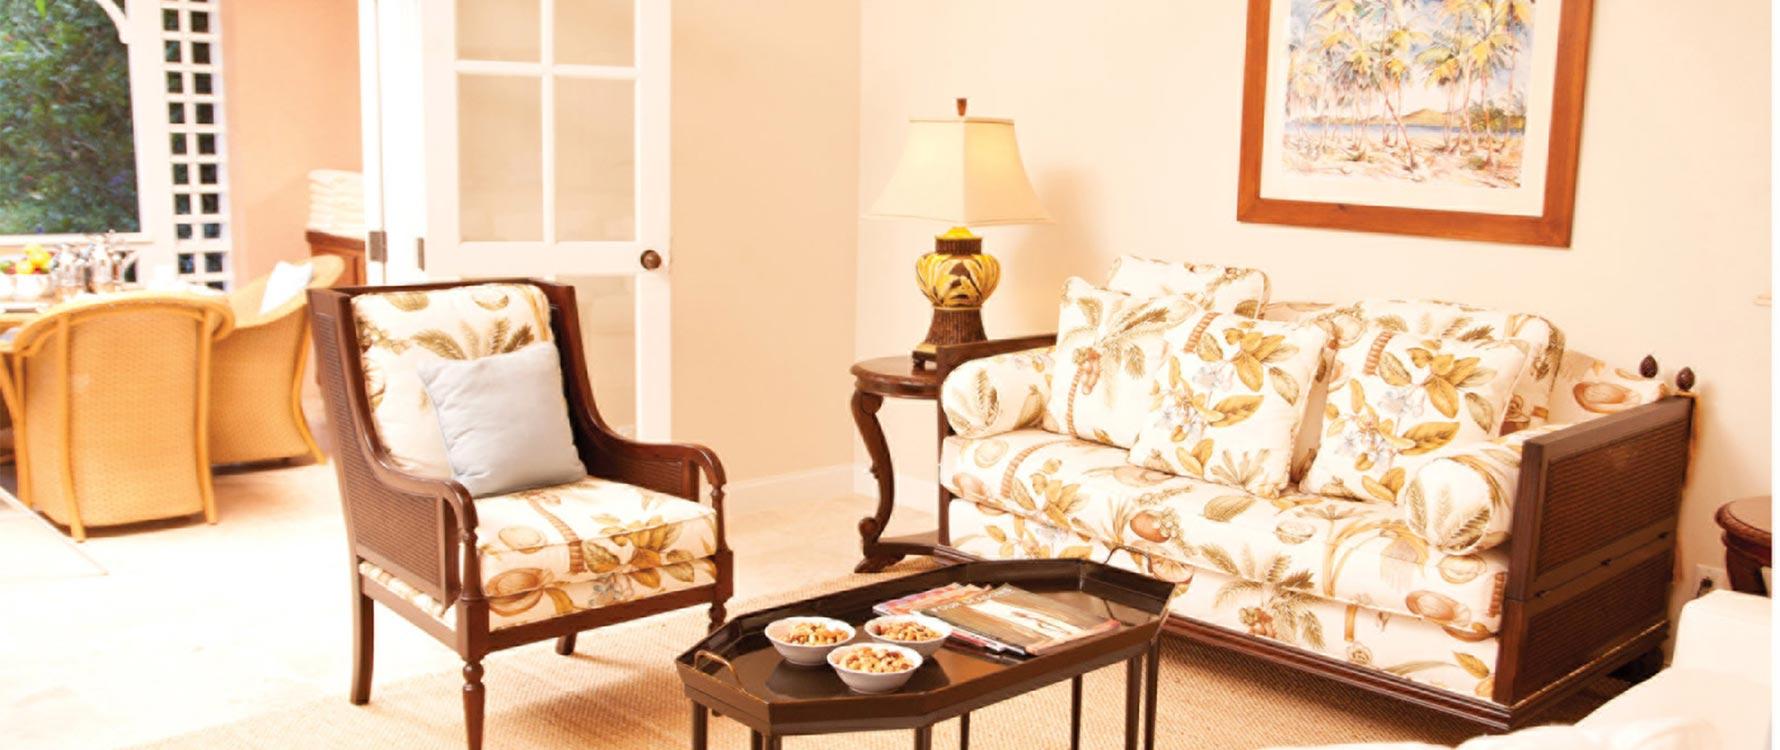 Living room with veranda view